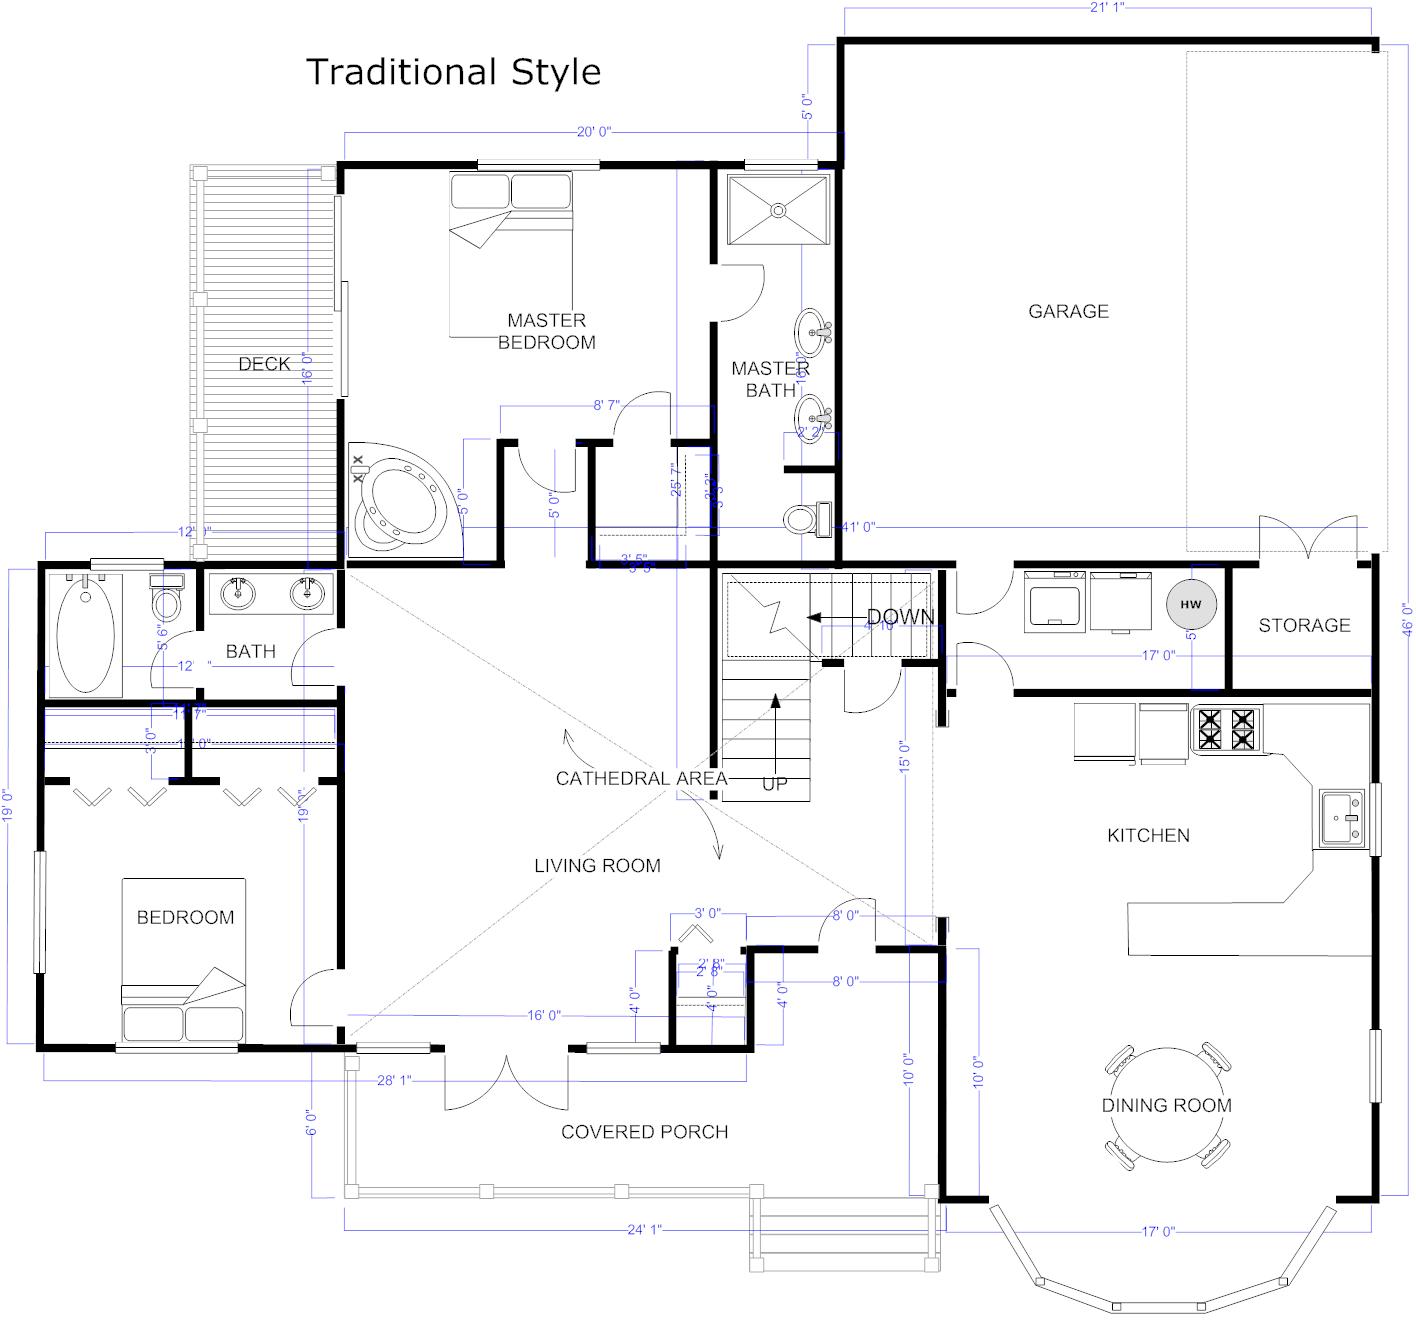 Smartdraw House Design Software Home Design Software Software